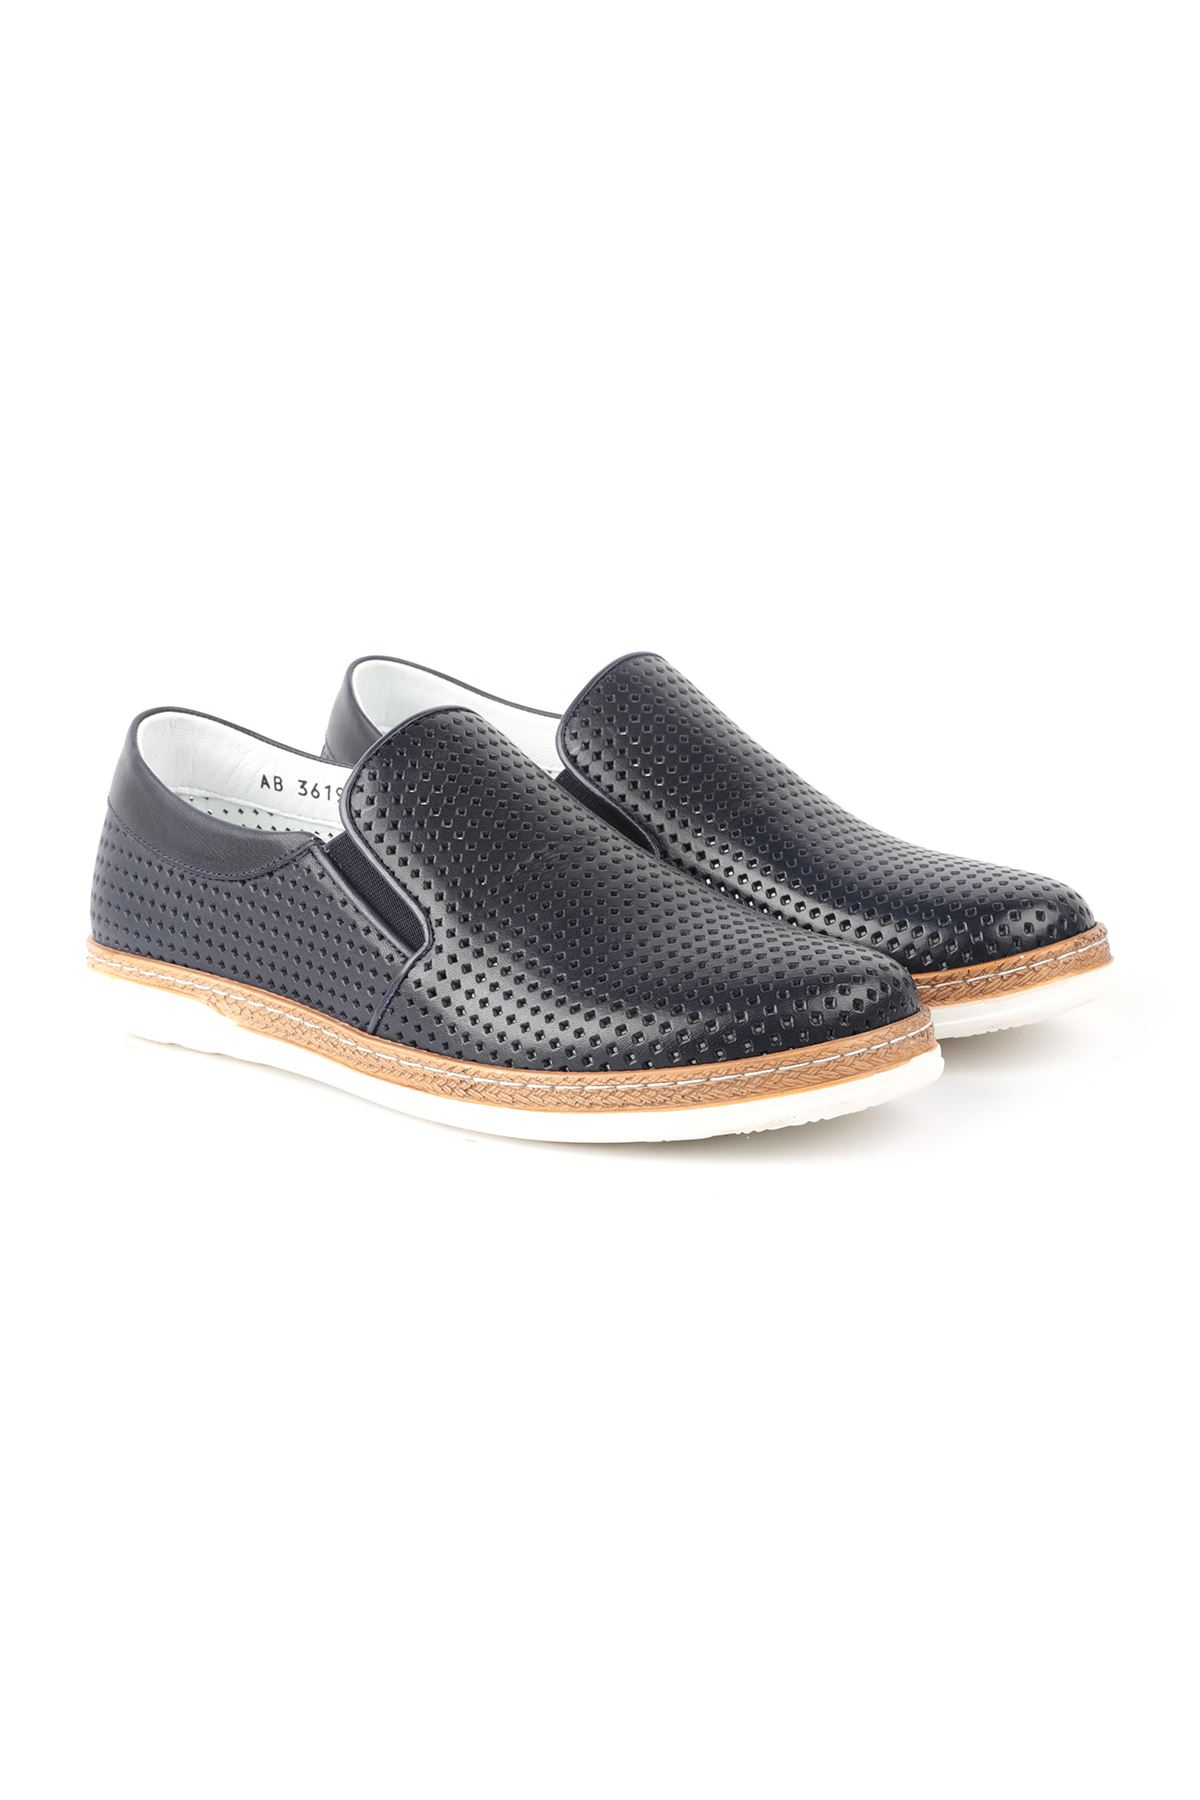 Libero L3619 Lacivert Loafer Erkek Ayakkabı